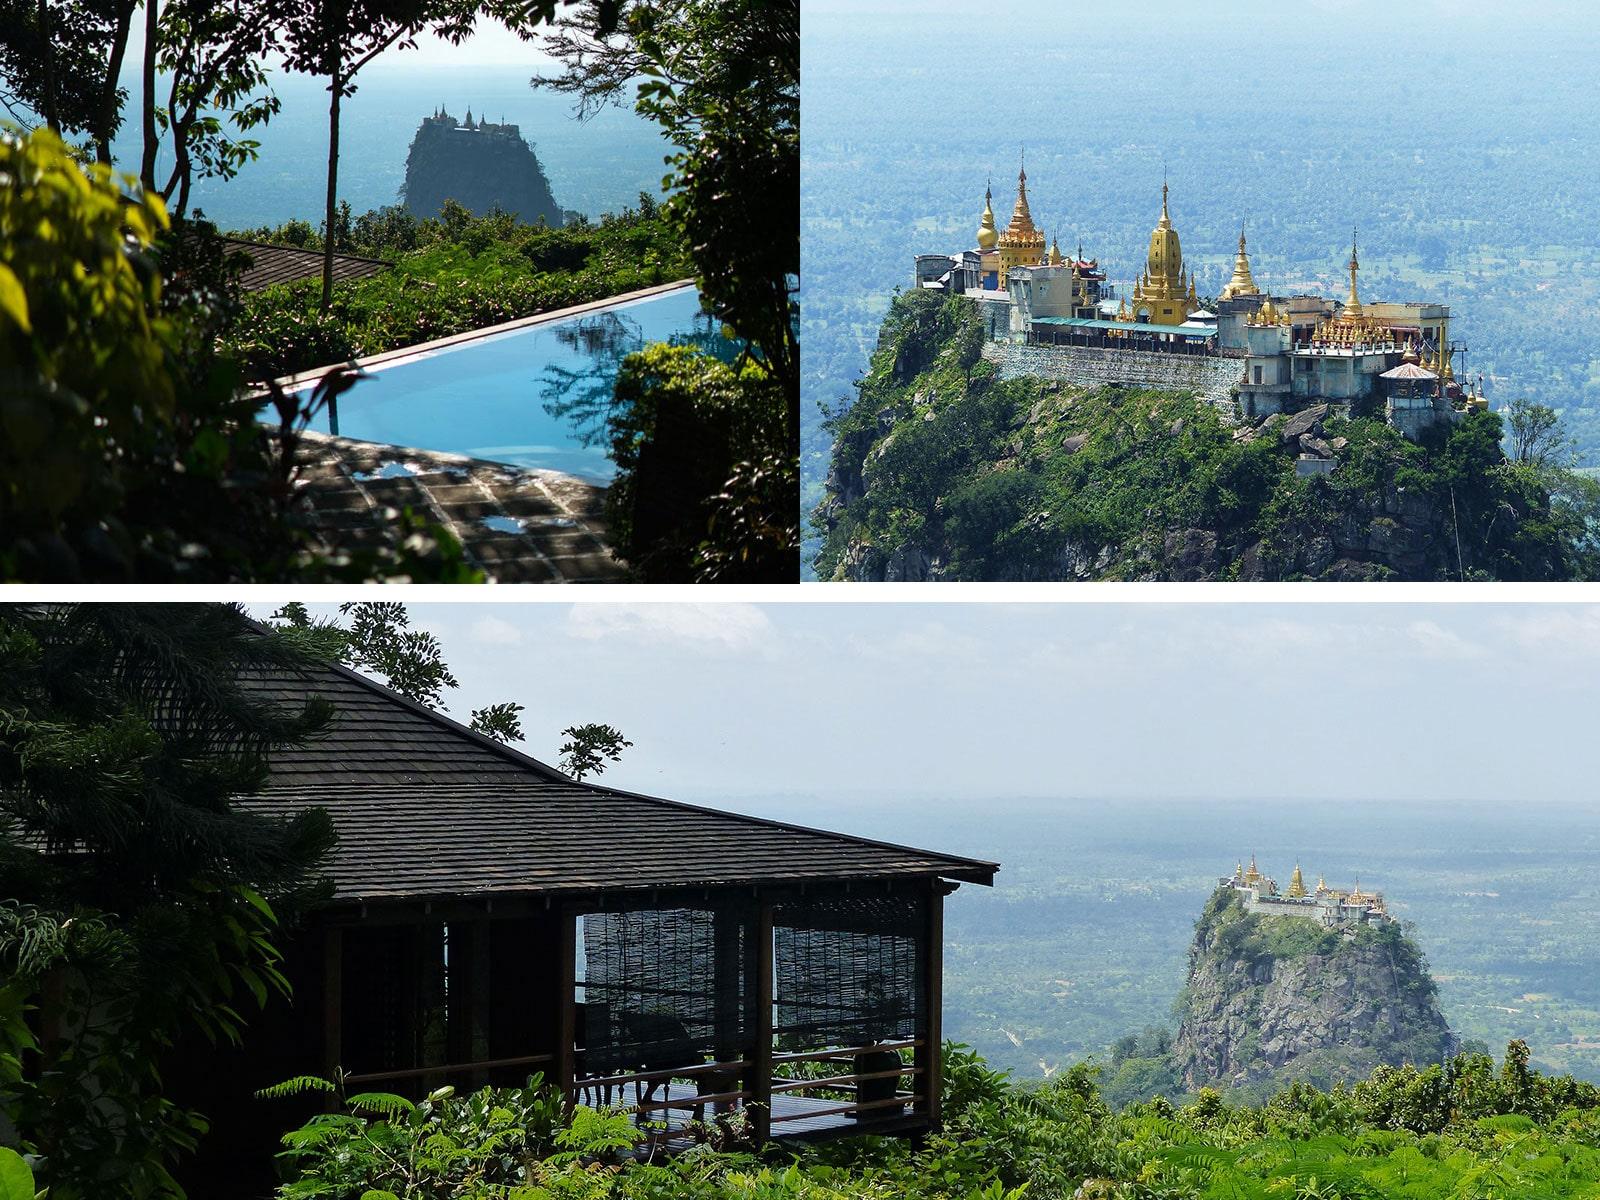 reisverslag myanmar blog lauren popa berg